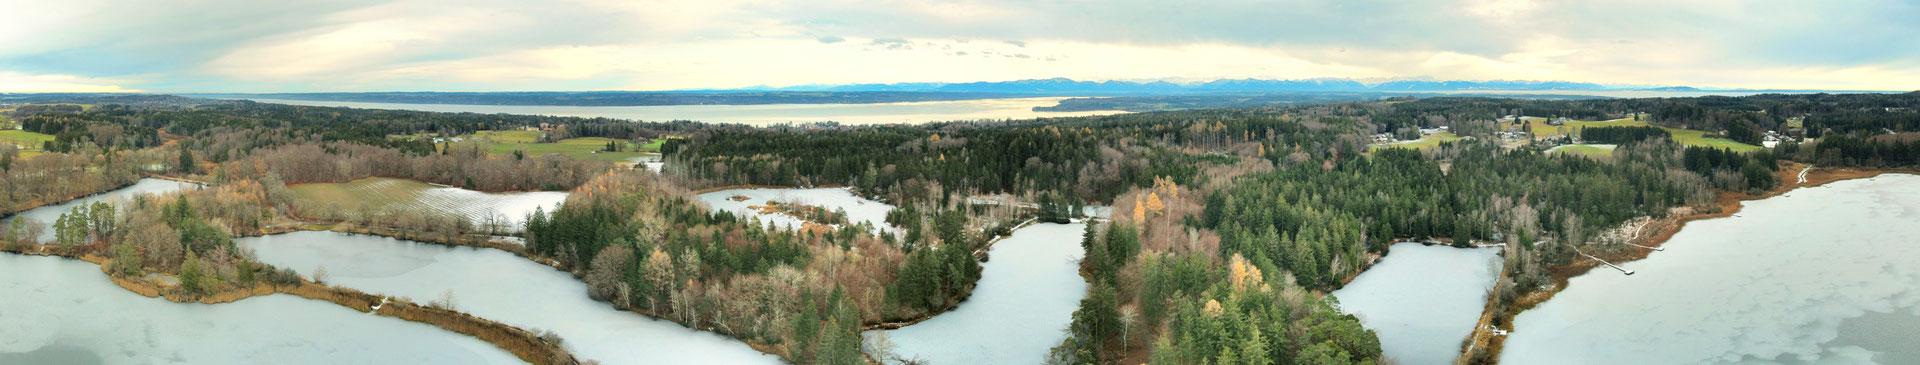 Panorama - Drohnenbild - Deixlfurter See - Starnberger See - Winter - Drohne - Drohnenfoto